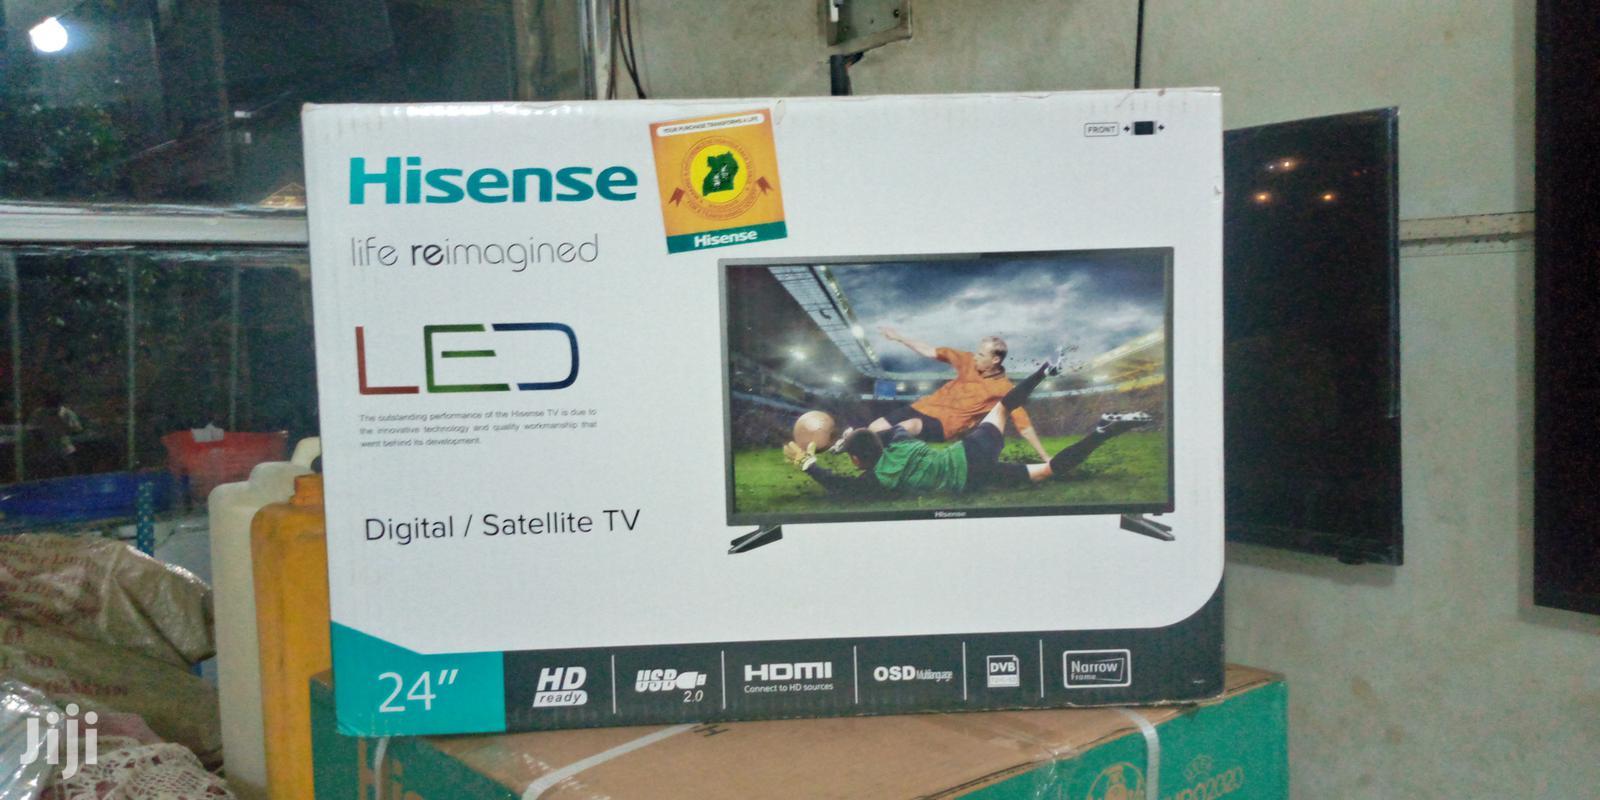 Hisense Digital TV 24 Inches